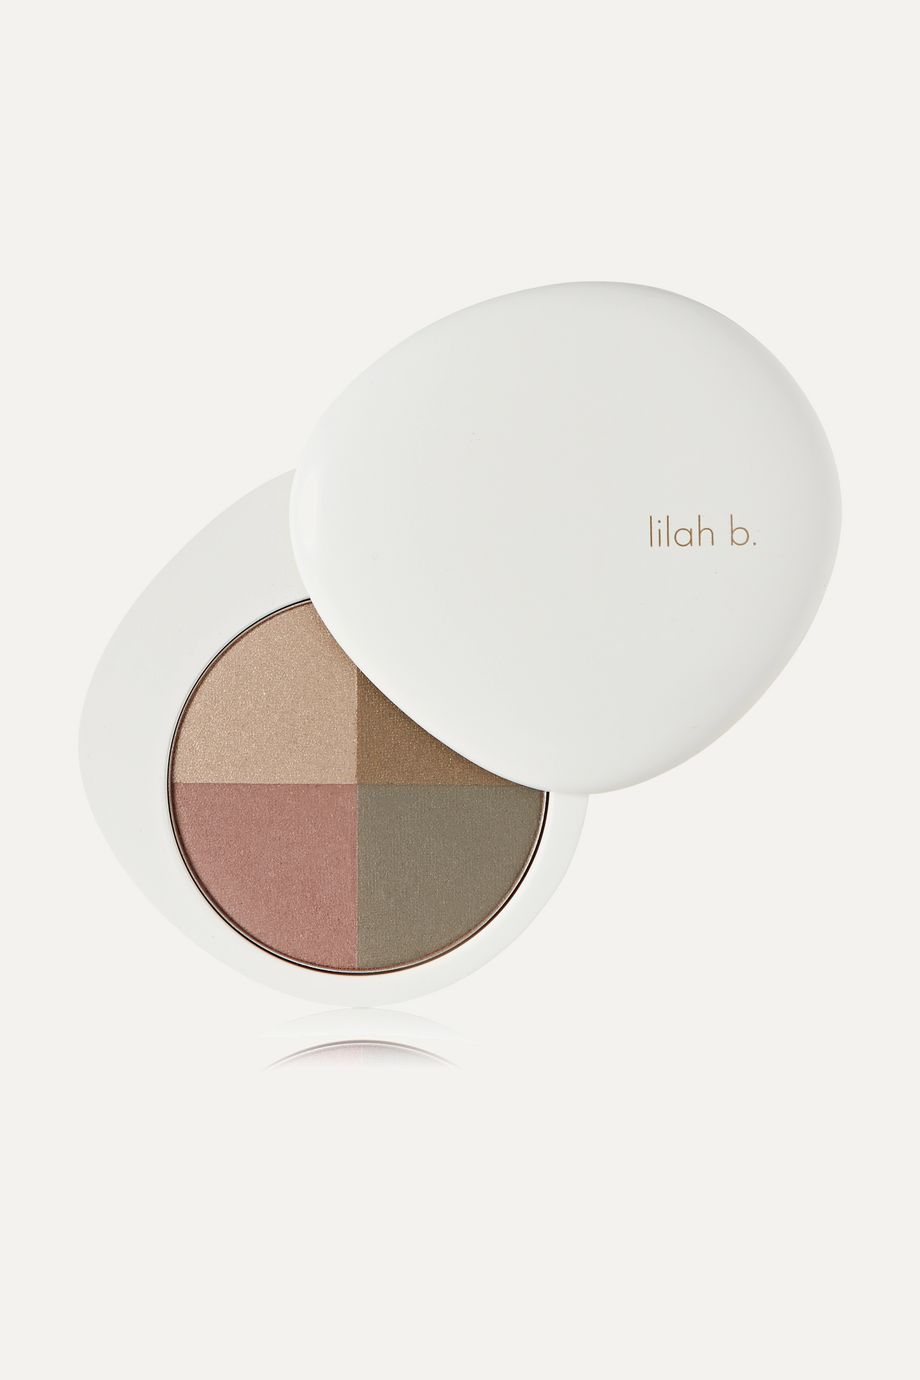 Lilah B. Palette Perfection Eye Quad - b.envied